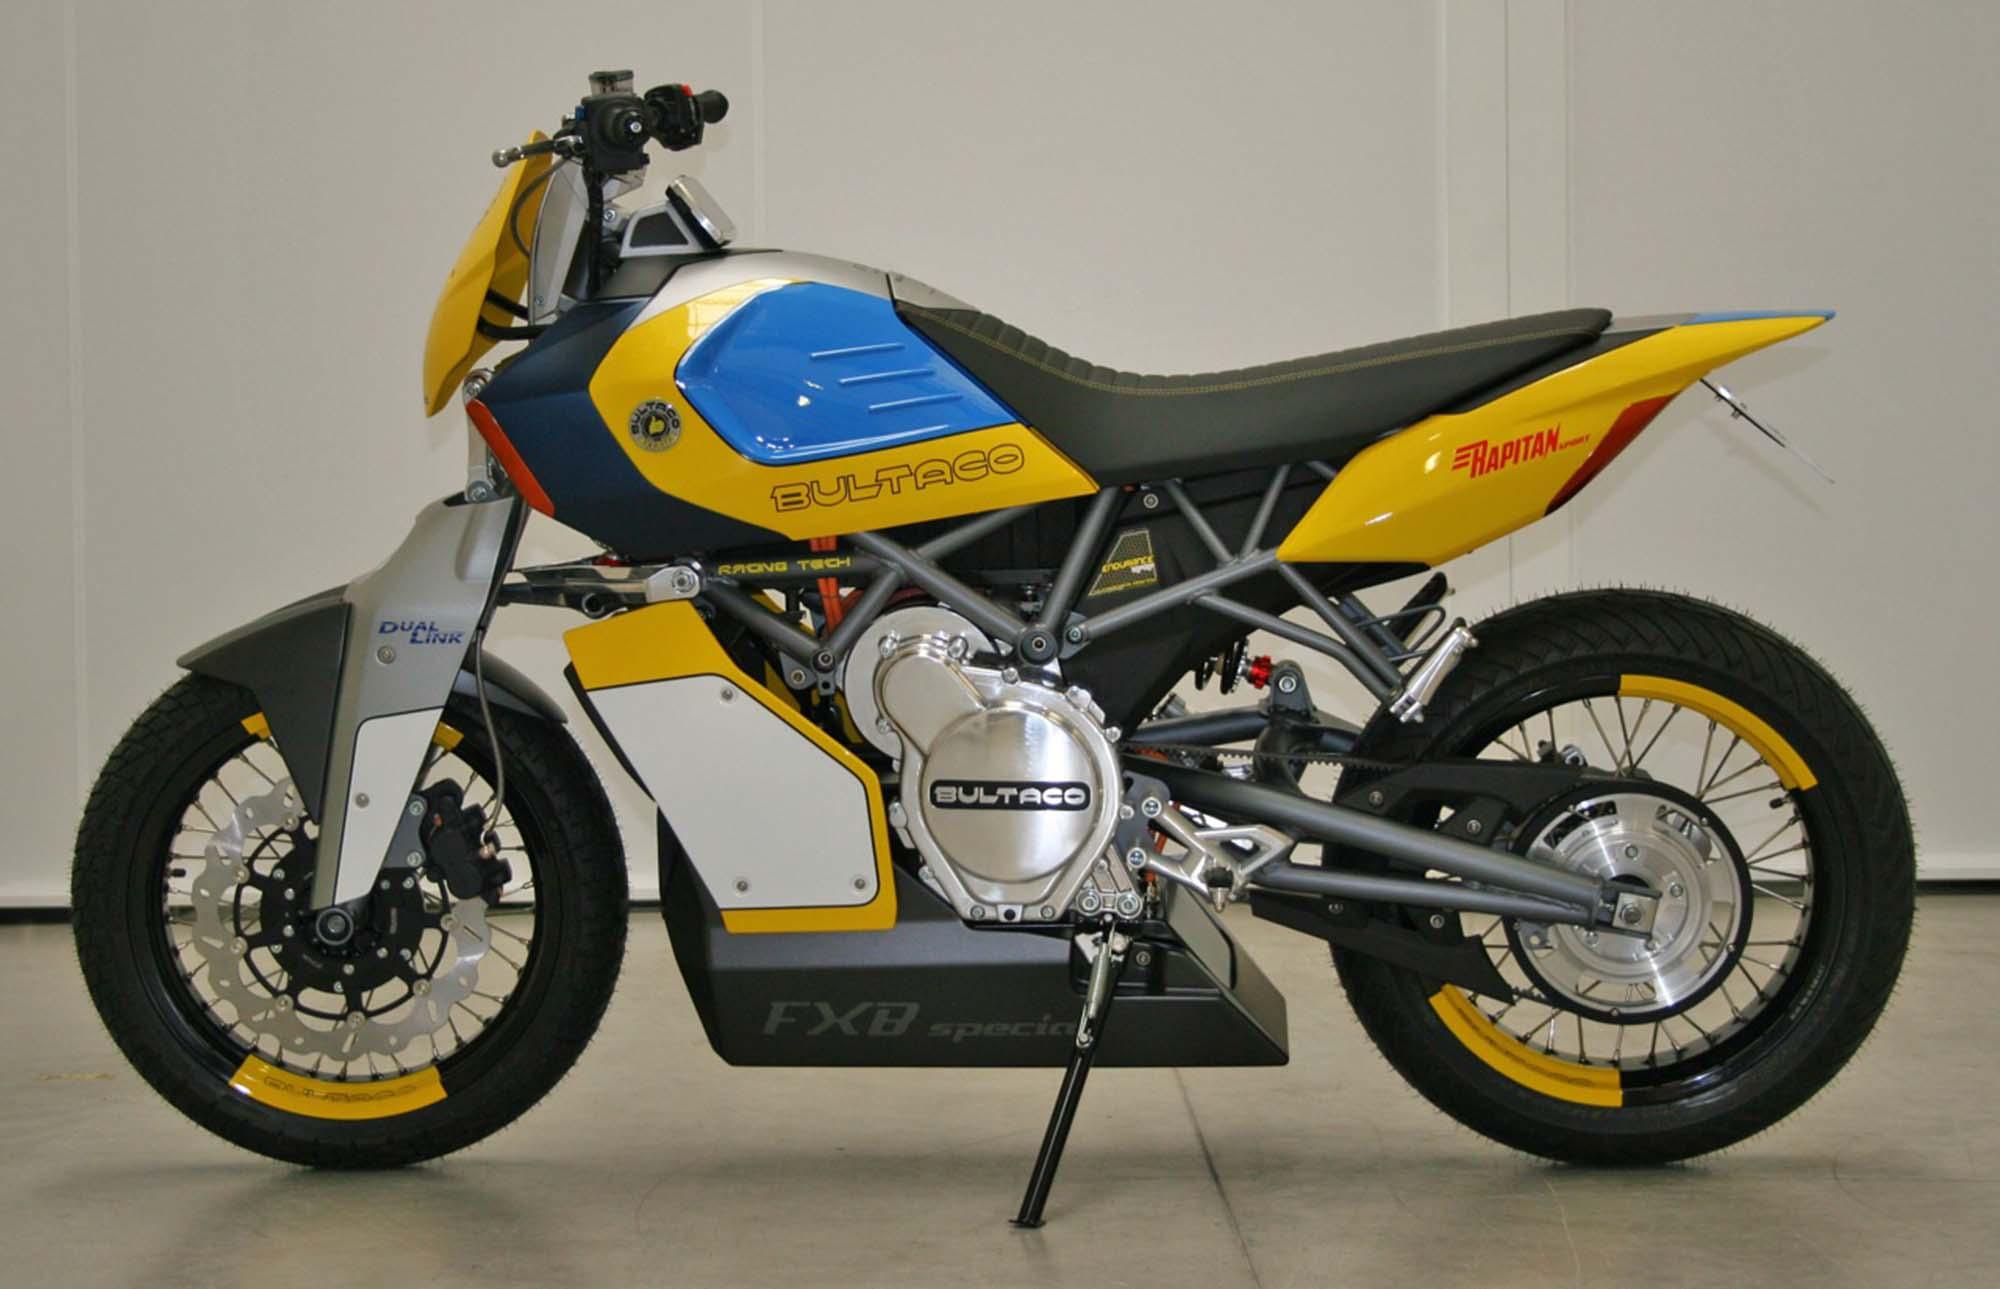 La sportive verte du futur - Page 15 Bultaco-Rapitan-Sport-Electric-street-bike-02